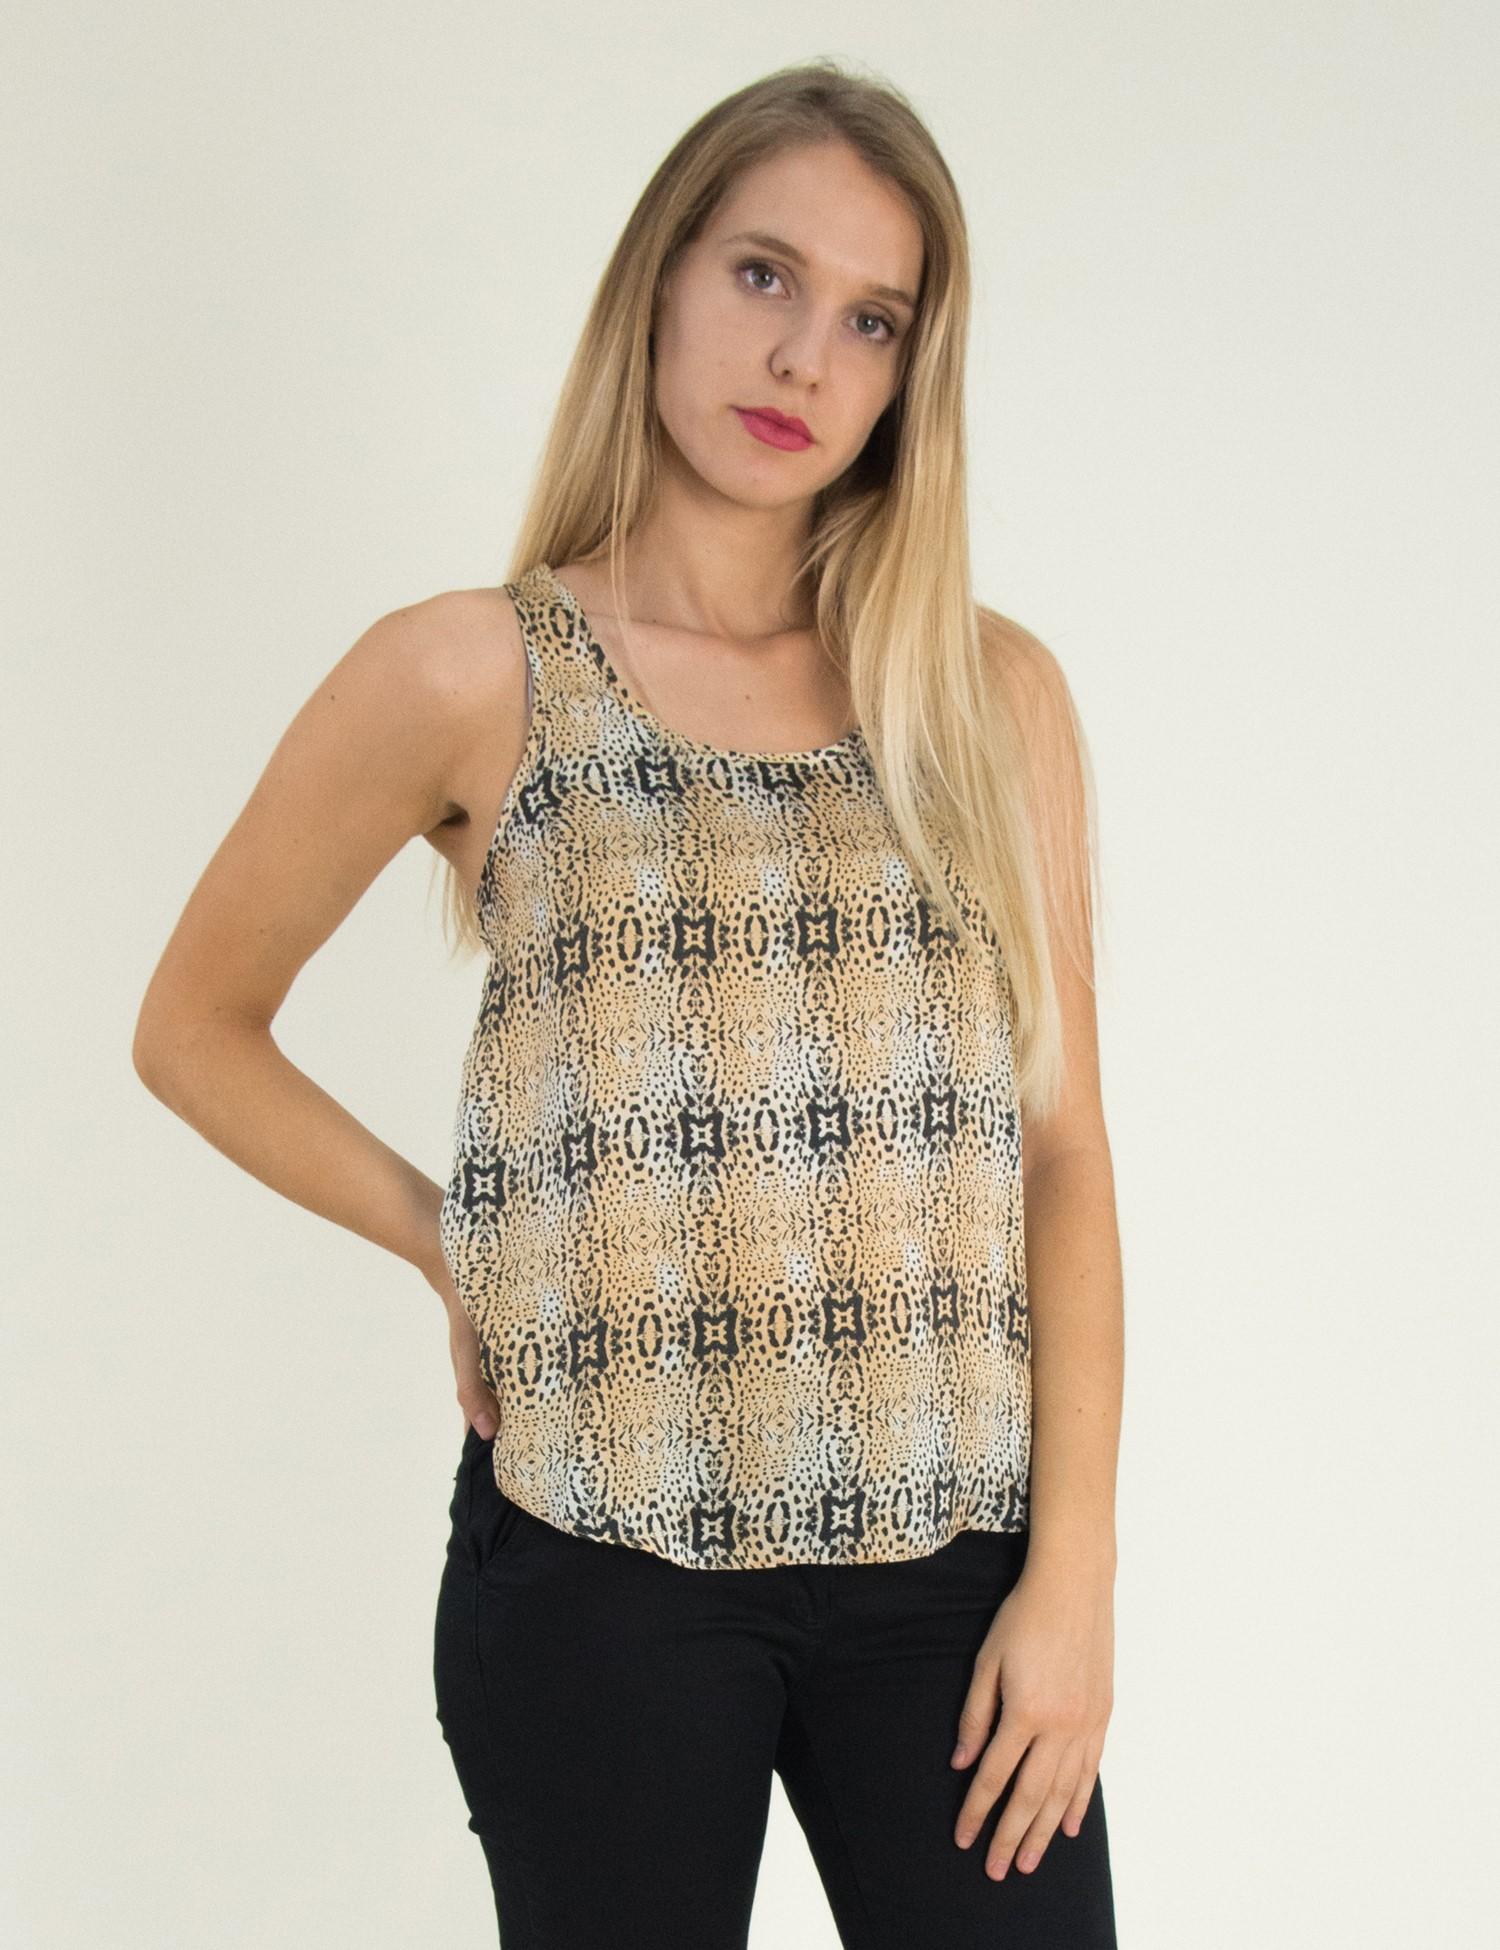 6d2c793a5faf Γυναικεία αμάνικη μπλούζα με animal print 162101